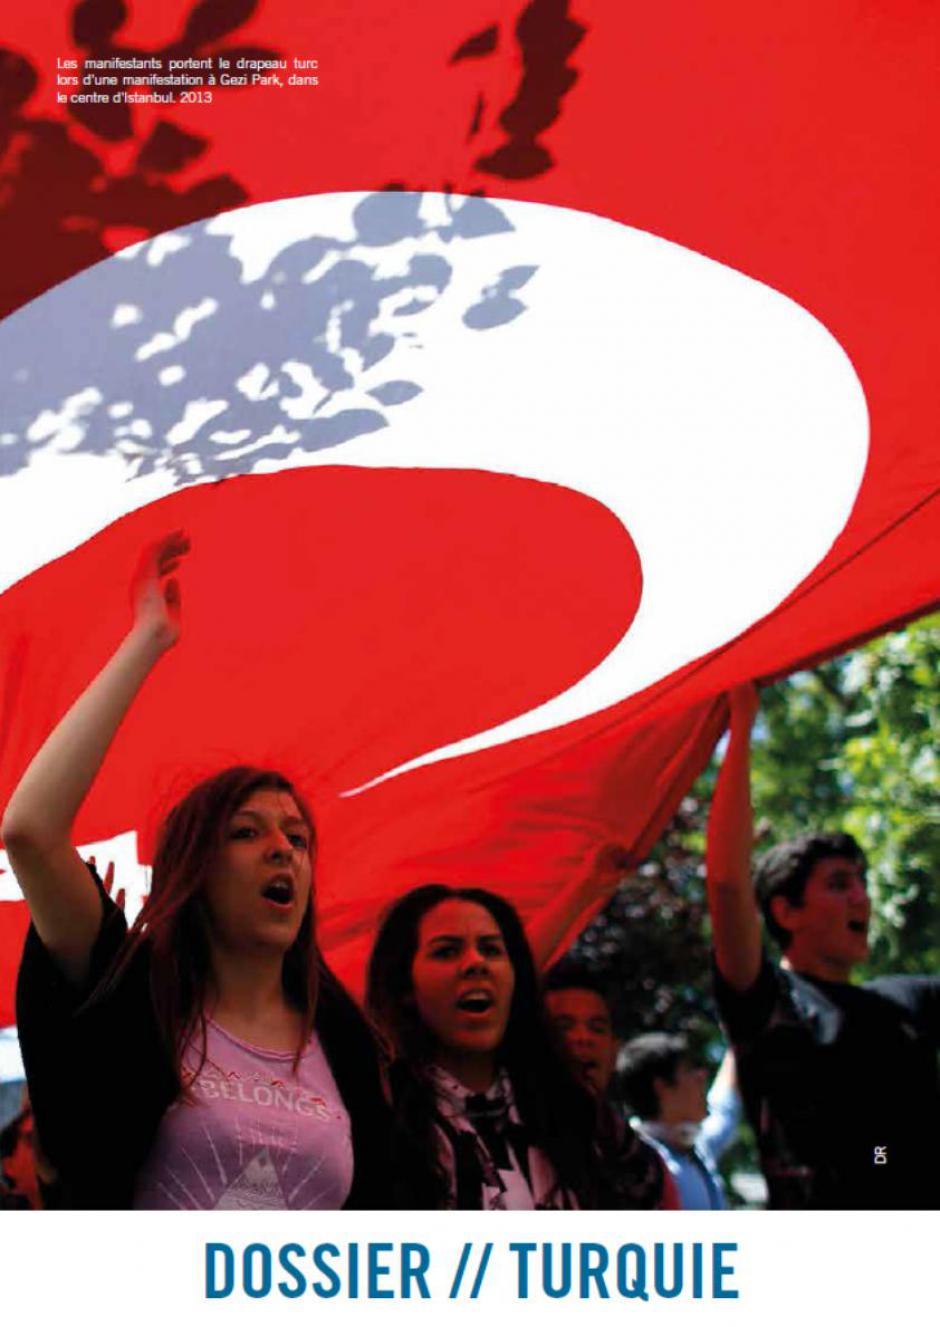 La dangereuse fuite en avant internationale de R.T. Erdogan